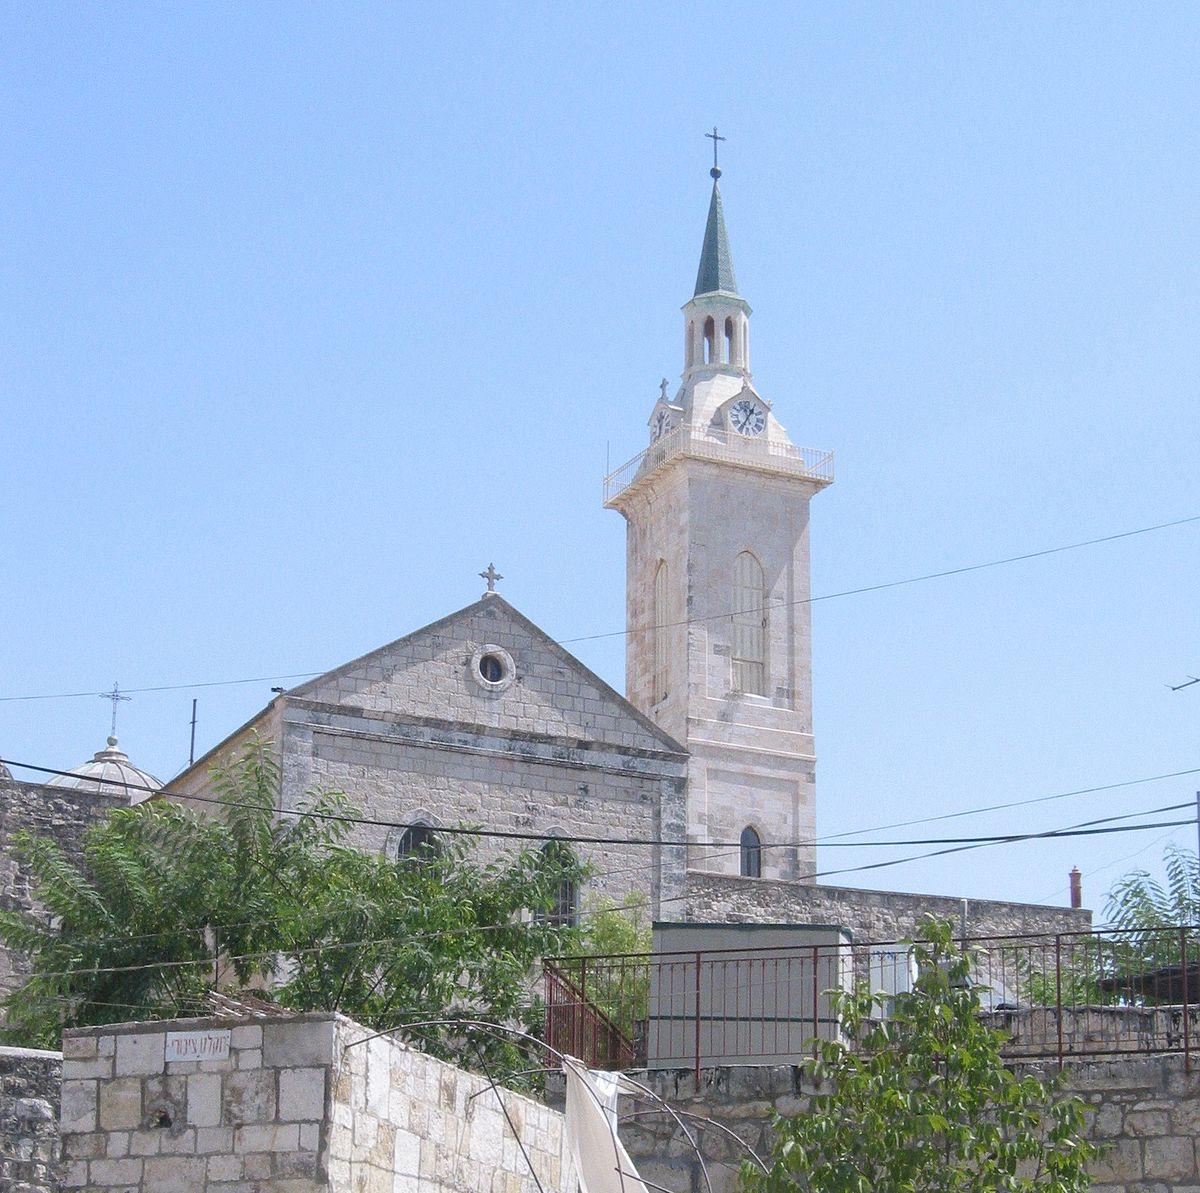 church of st john - photo #12